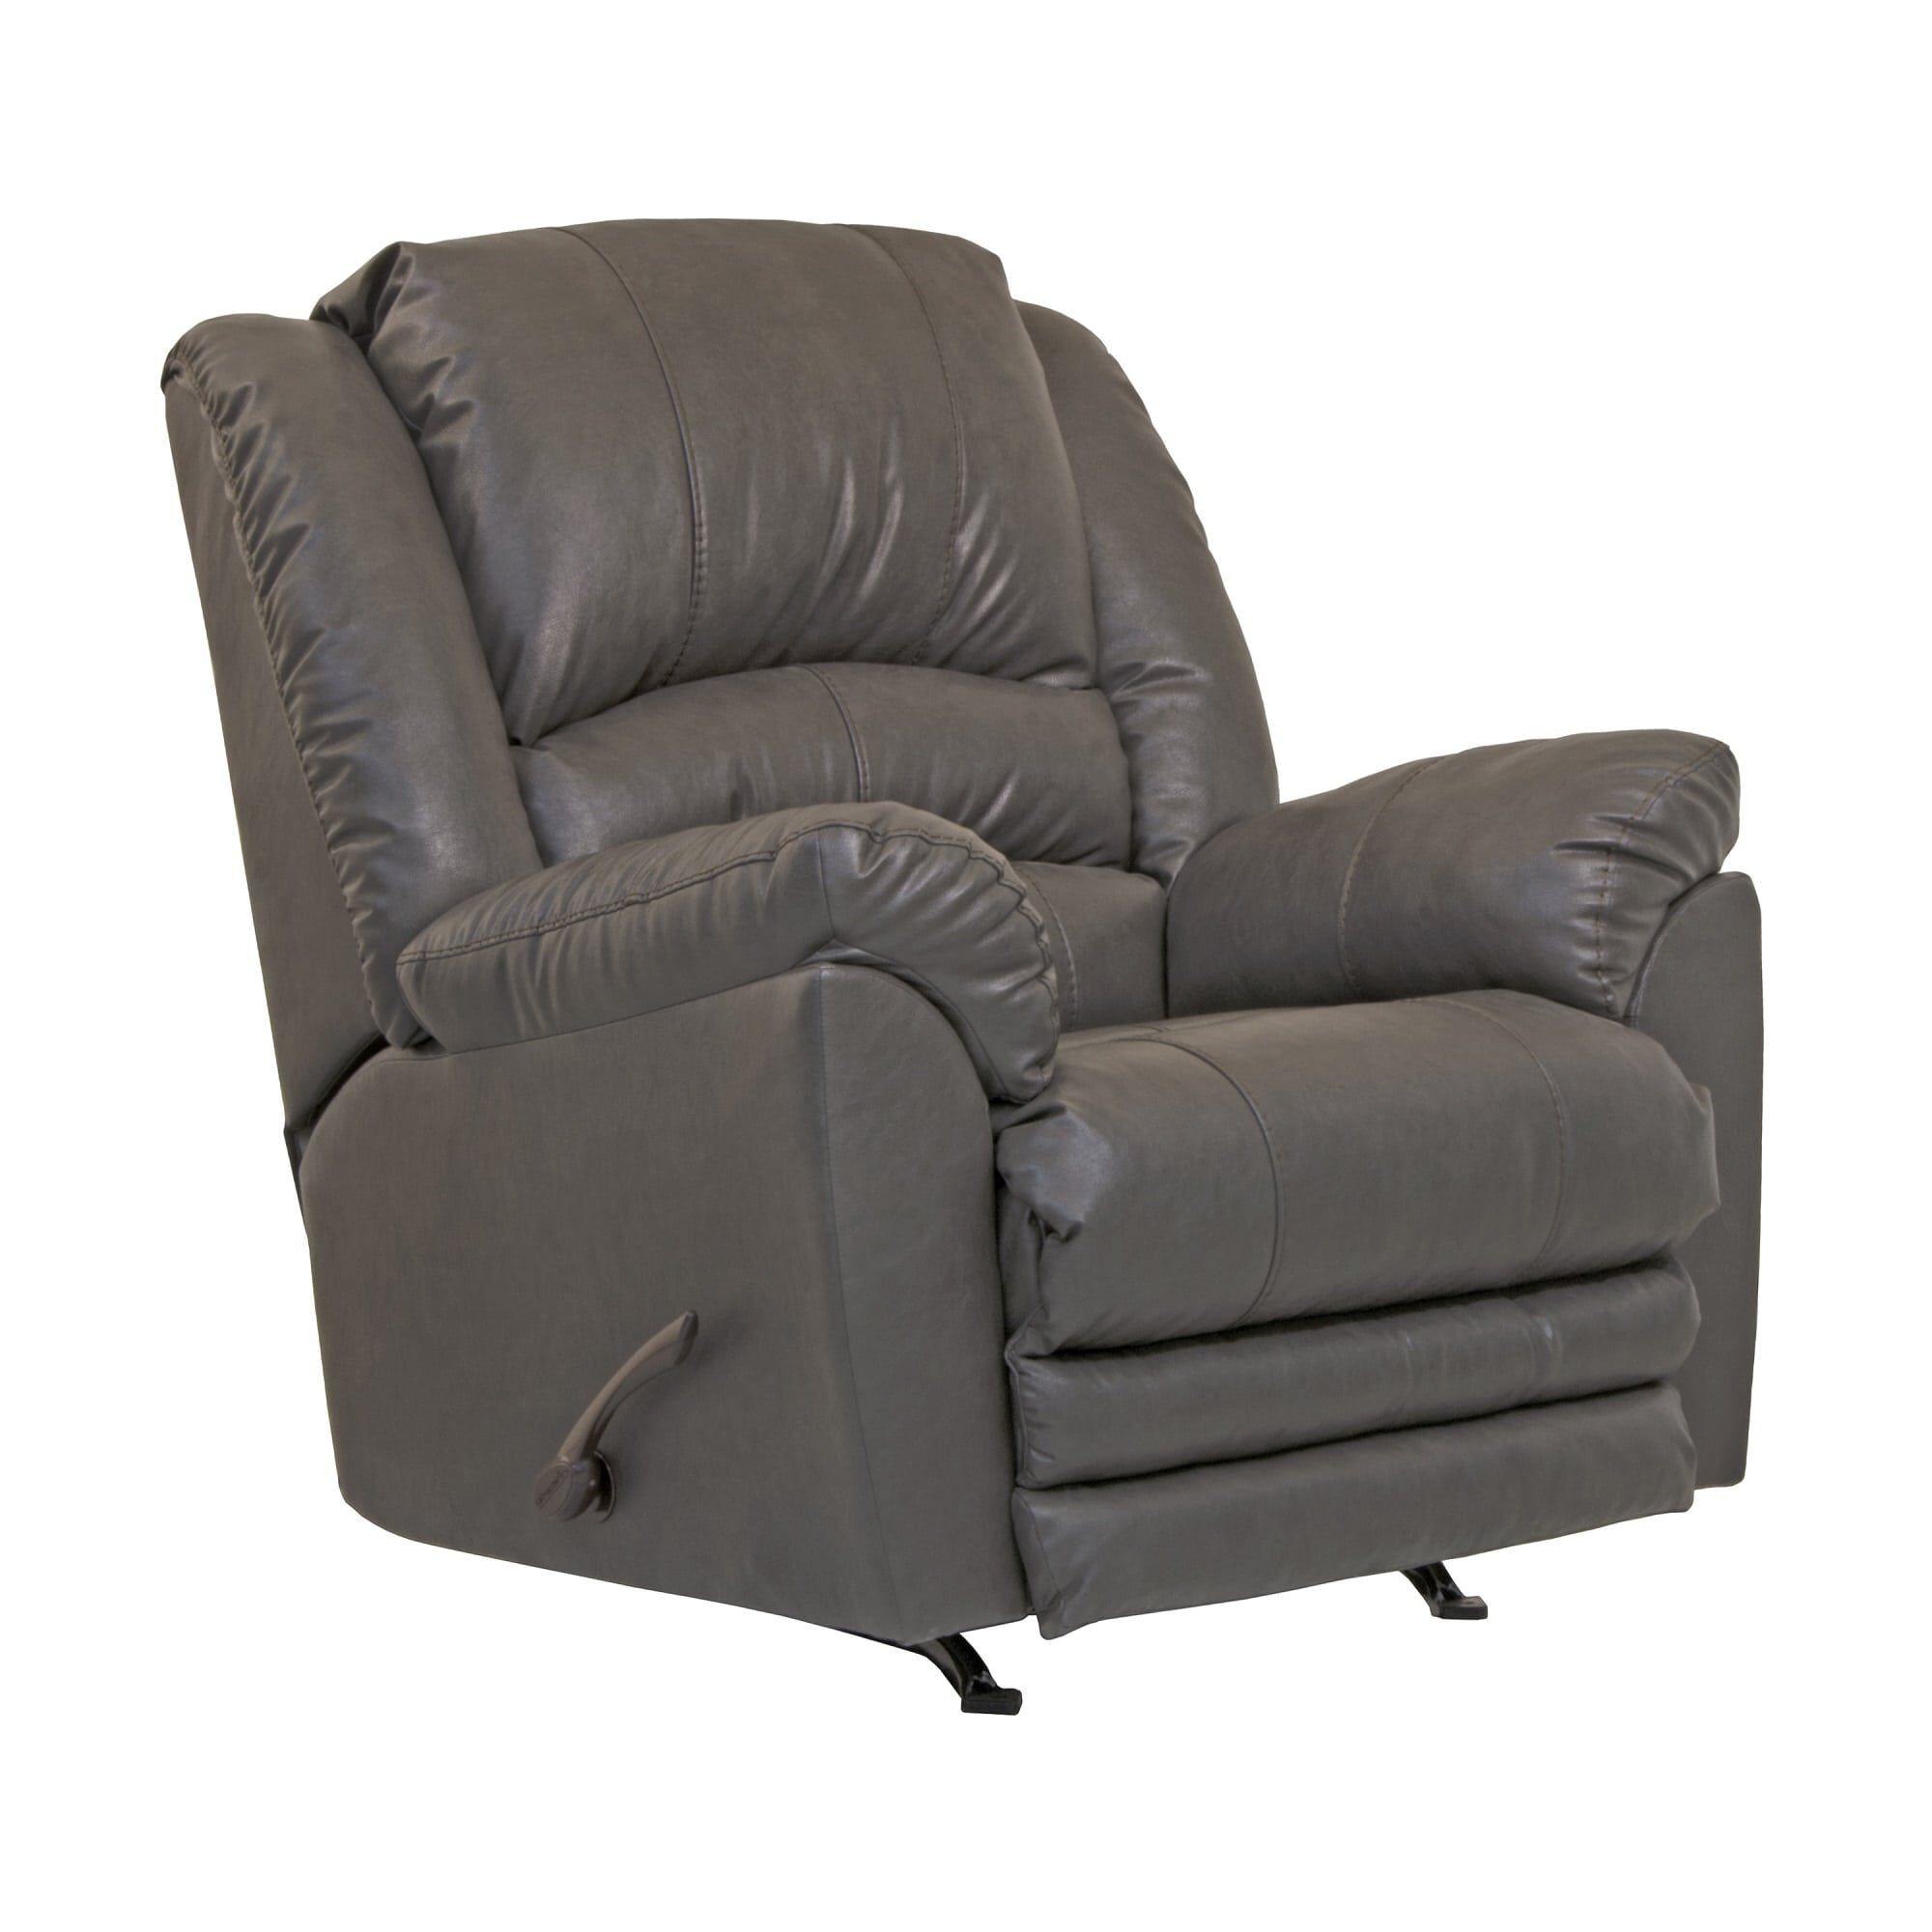 big man chairs bungee chair purple jackson furniture recliners rocker recliner